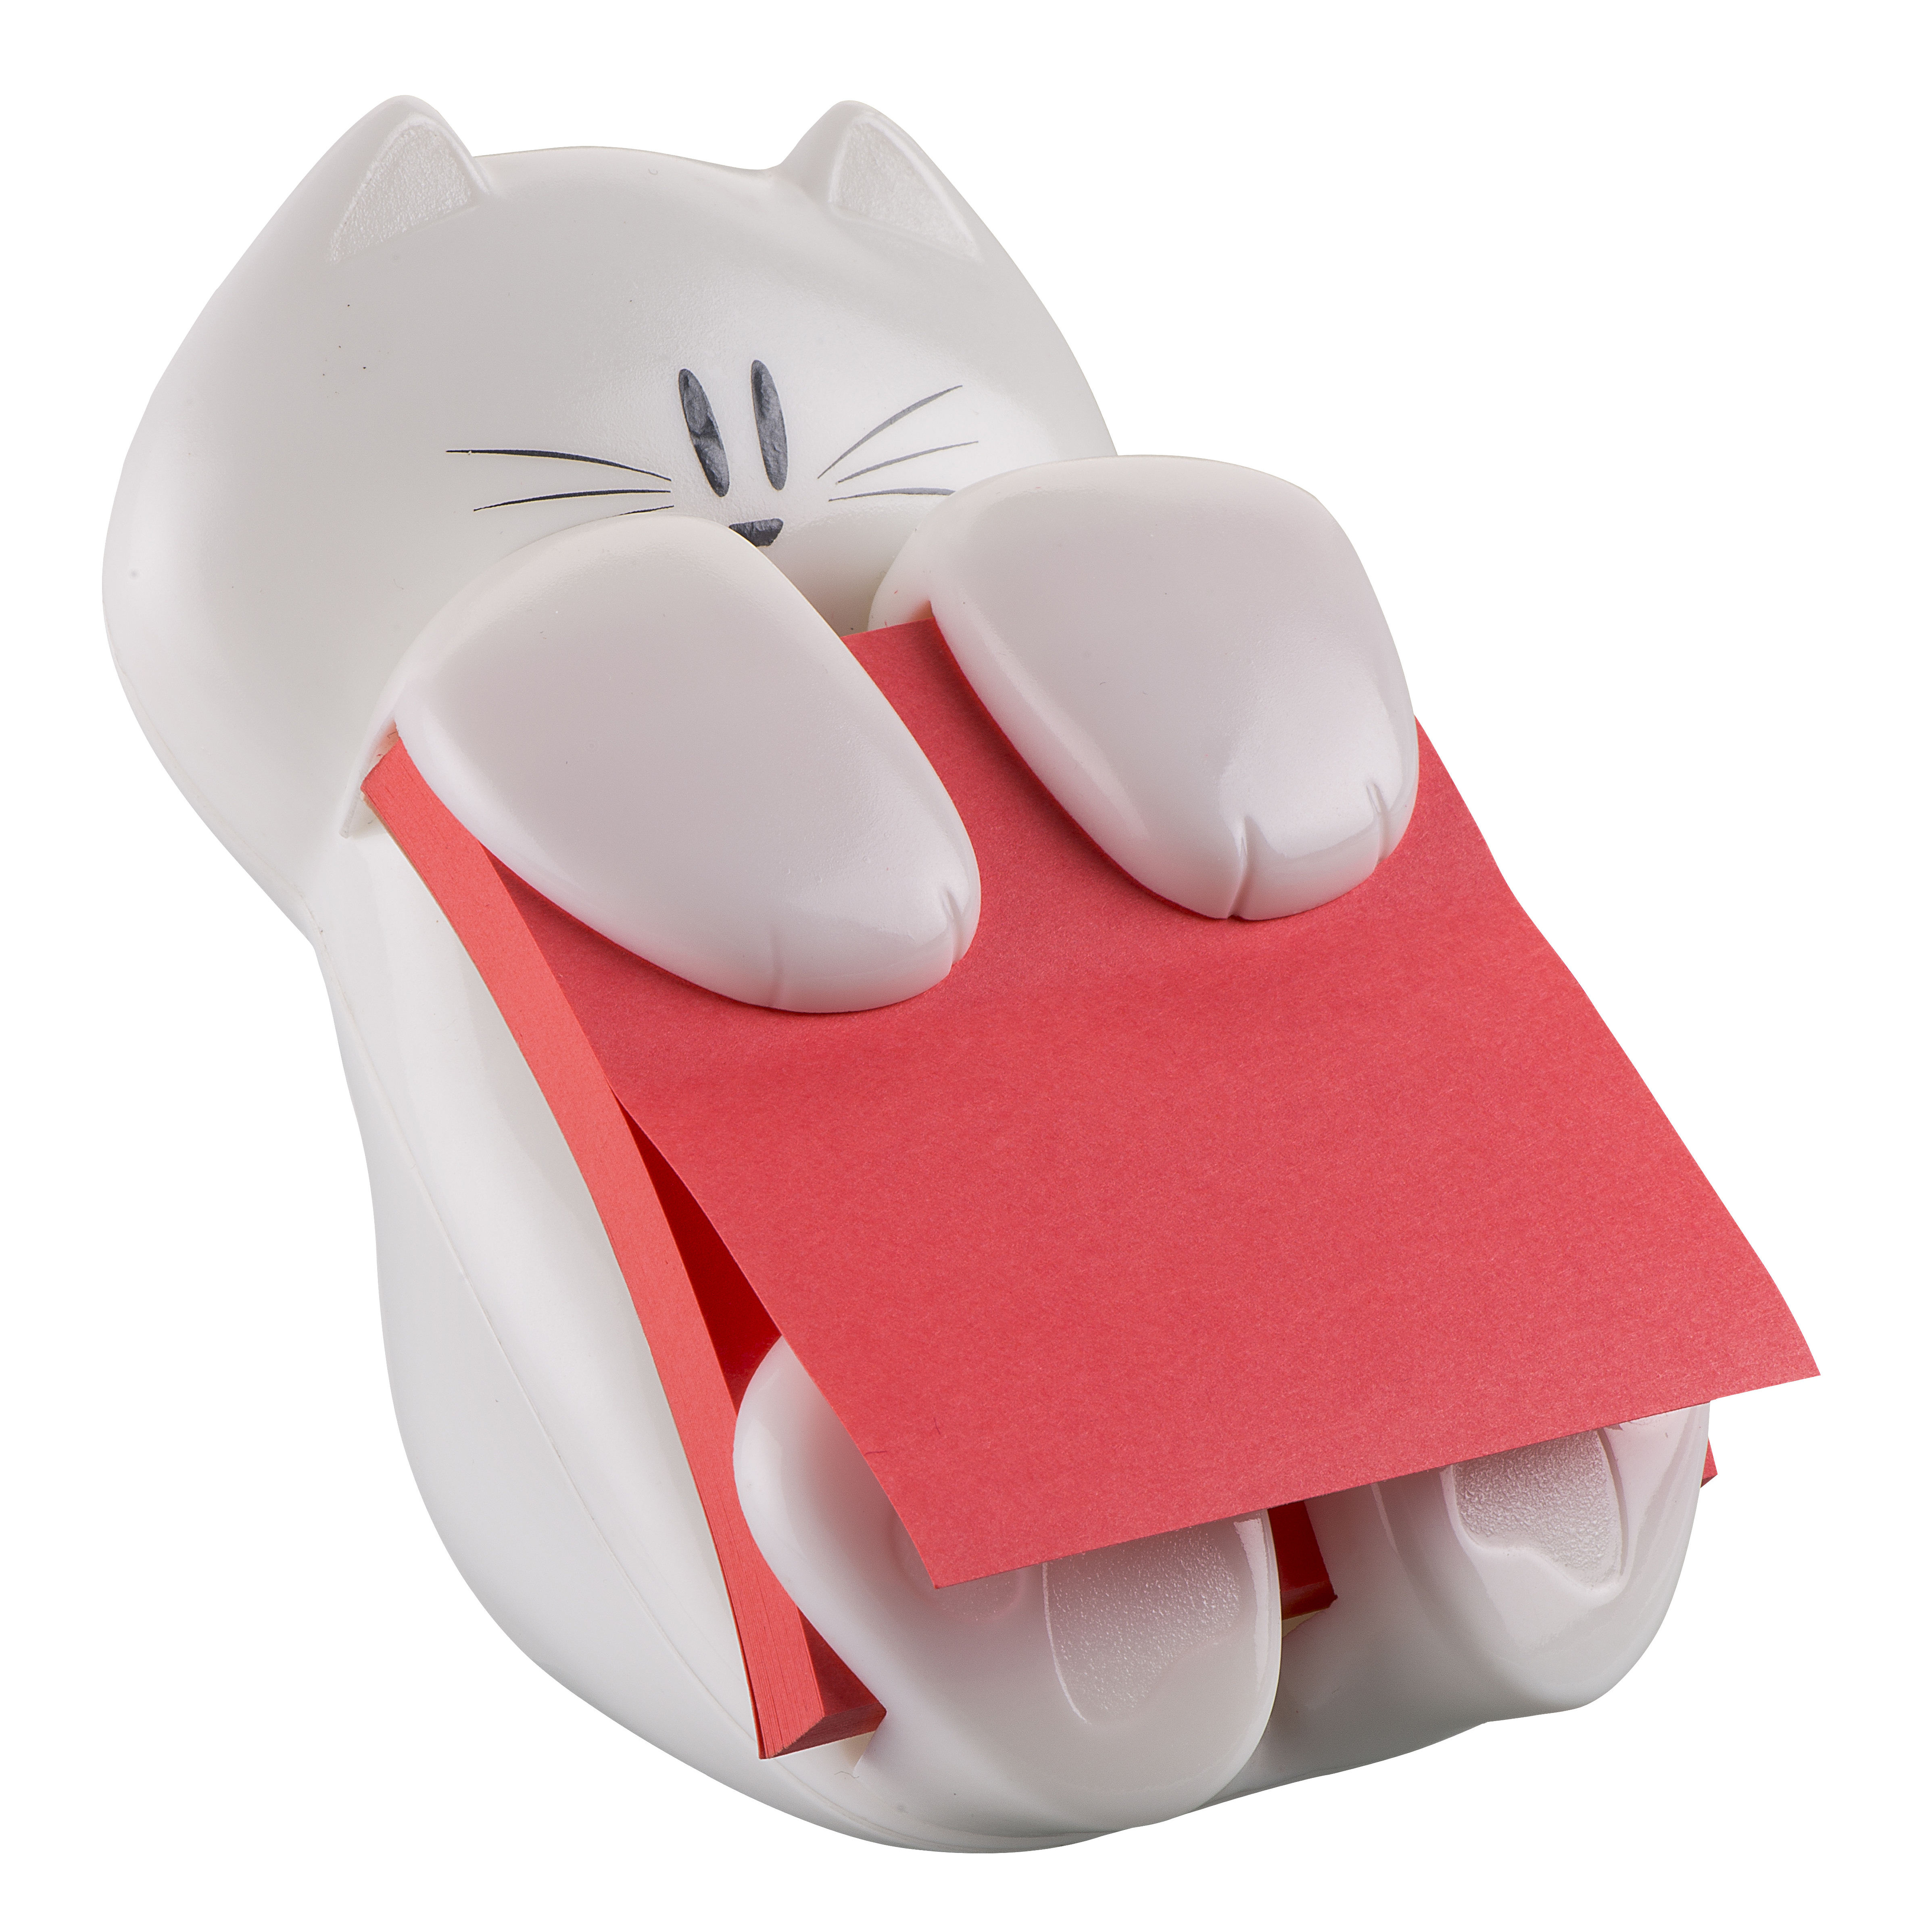 Image for 3M Post-it Z-Note Cat Dispenser 76x76mm CAT-330